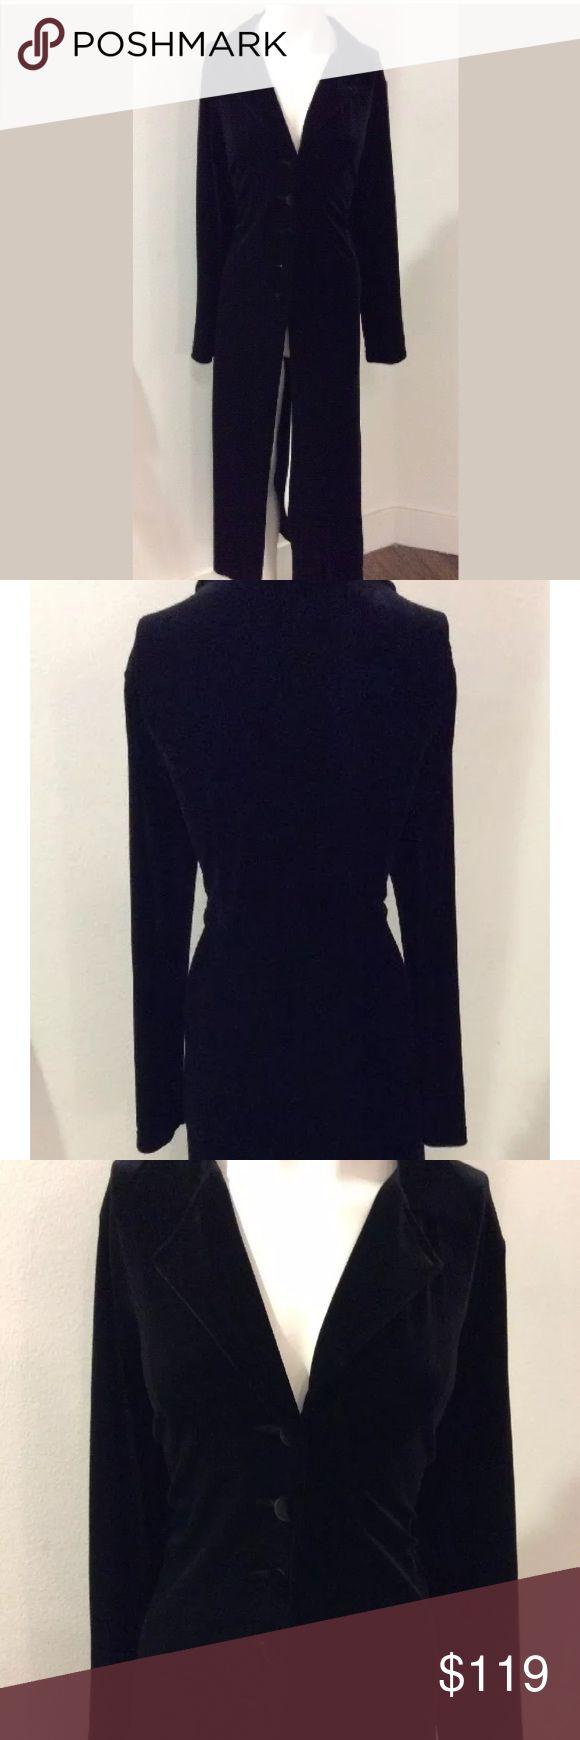 Cabi trench coat velvet Xs black Cabi designer trench velvet nwt CAbi Jackets & Coats Trench Coats